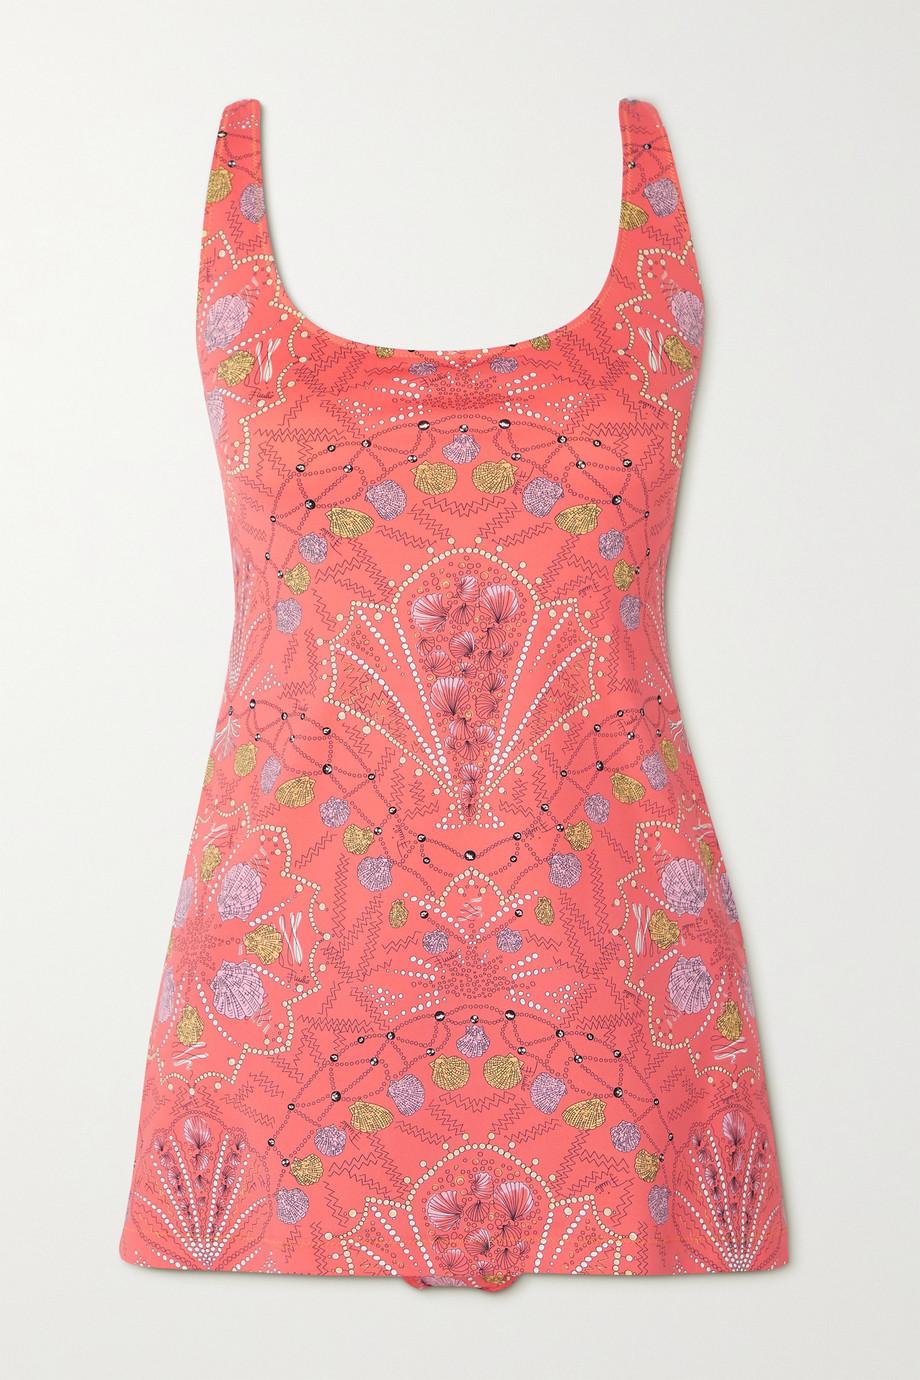 Emilio Pucci + NET SUSTAIN printed stretch-ECONYL swimsuit